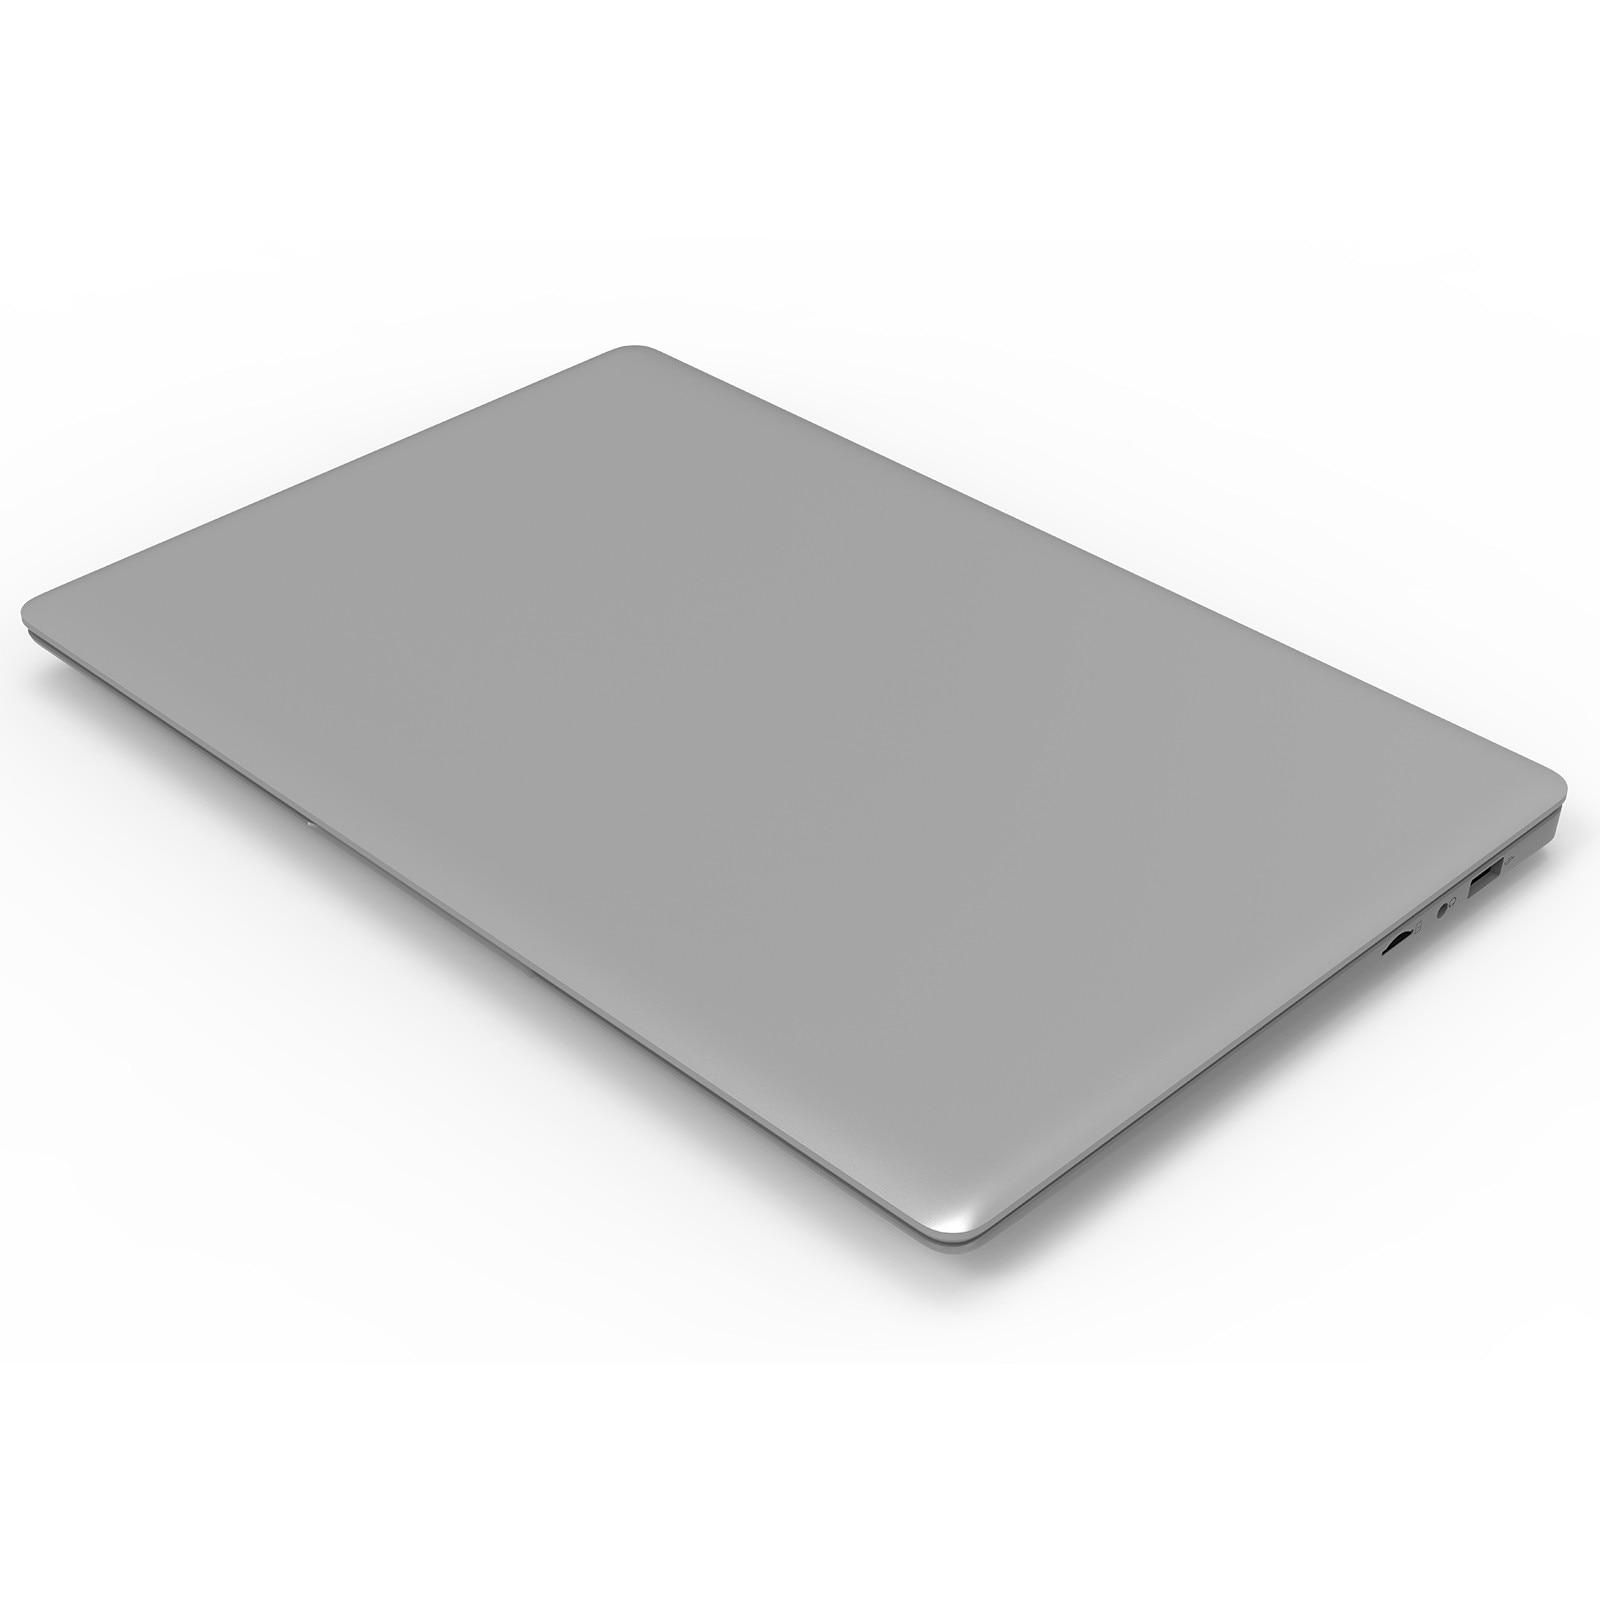 Newest Cheap student Laptop Notebook 1.68KG 14 Inch 6GB DDR3 128G 256GB 512G 1TB SSD Intel Notebook Windows 10 Laptops